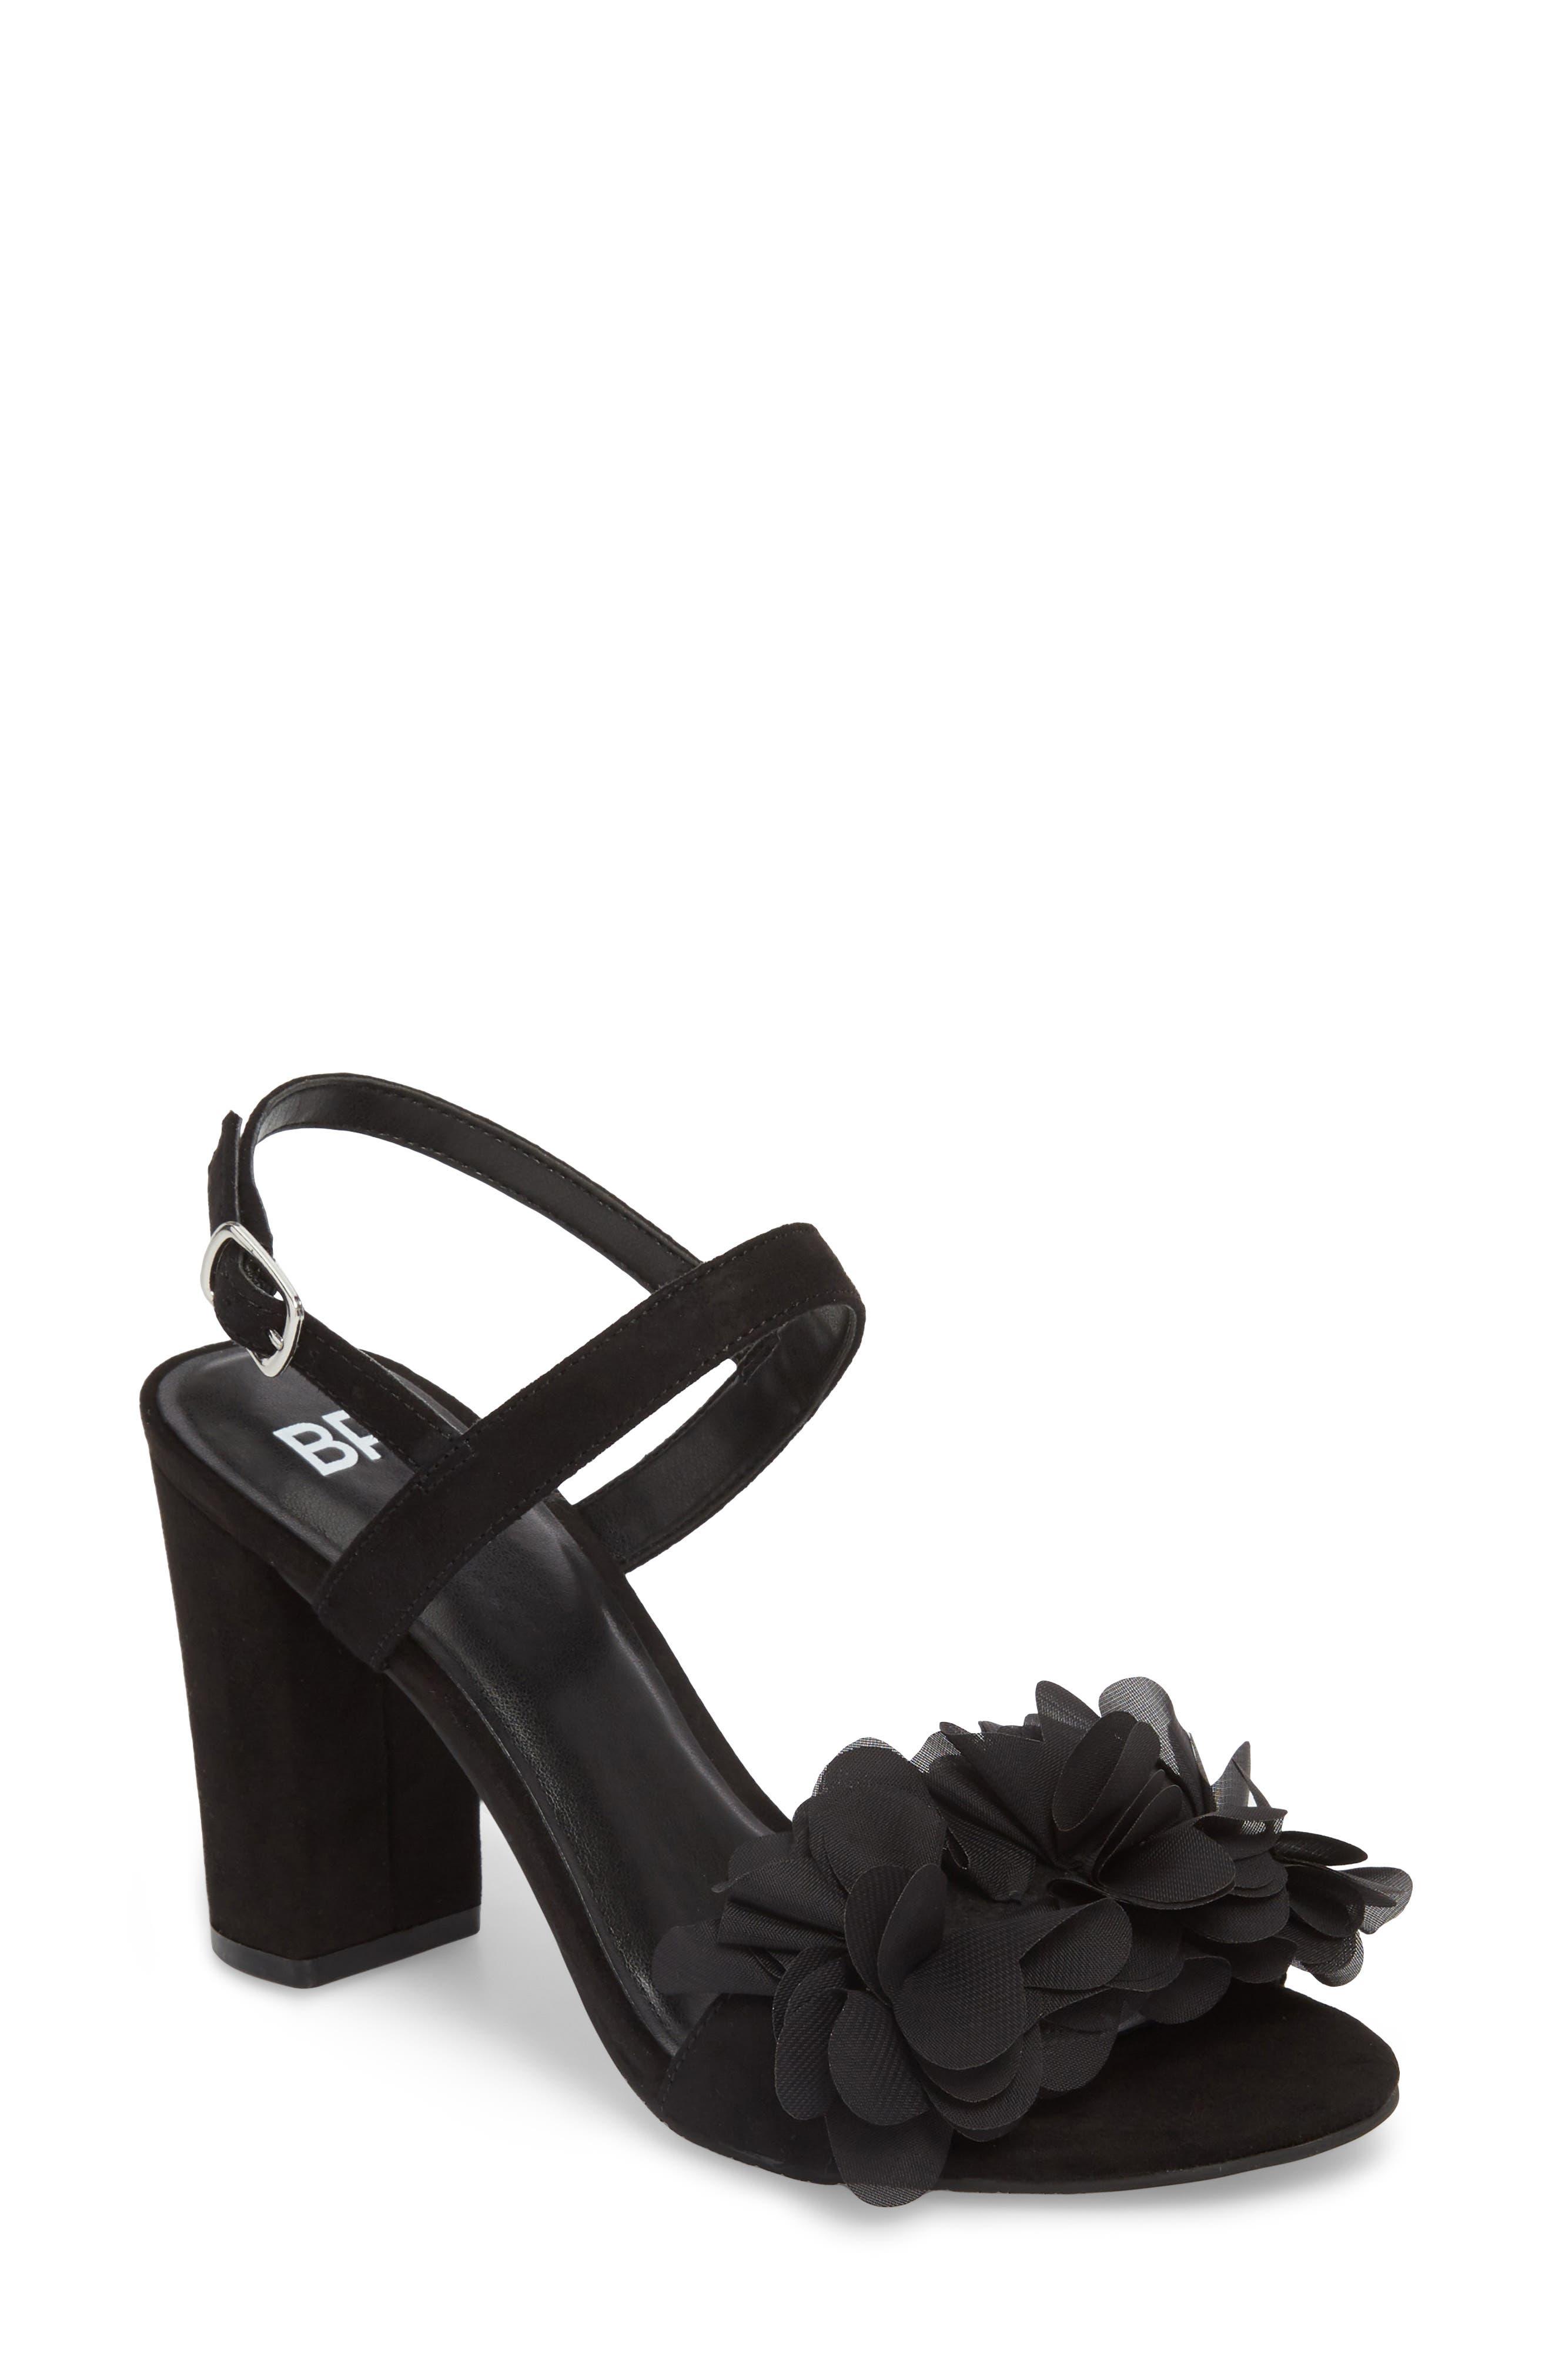 Lula Block Heel Slingback Sandal,                             Main thumbnail 1, color,                             BLACK FLOWERS FABRIC